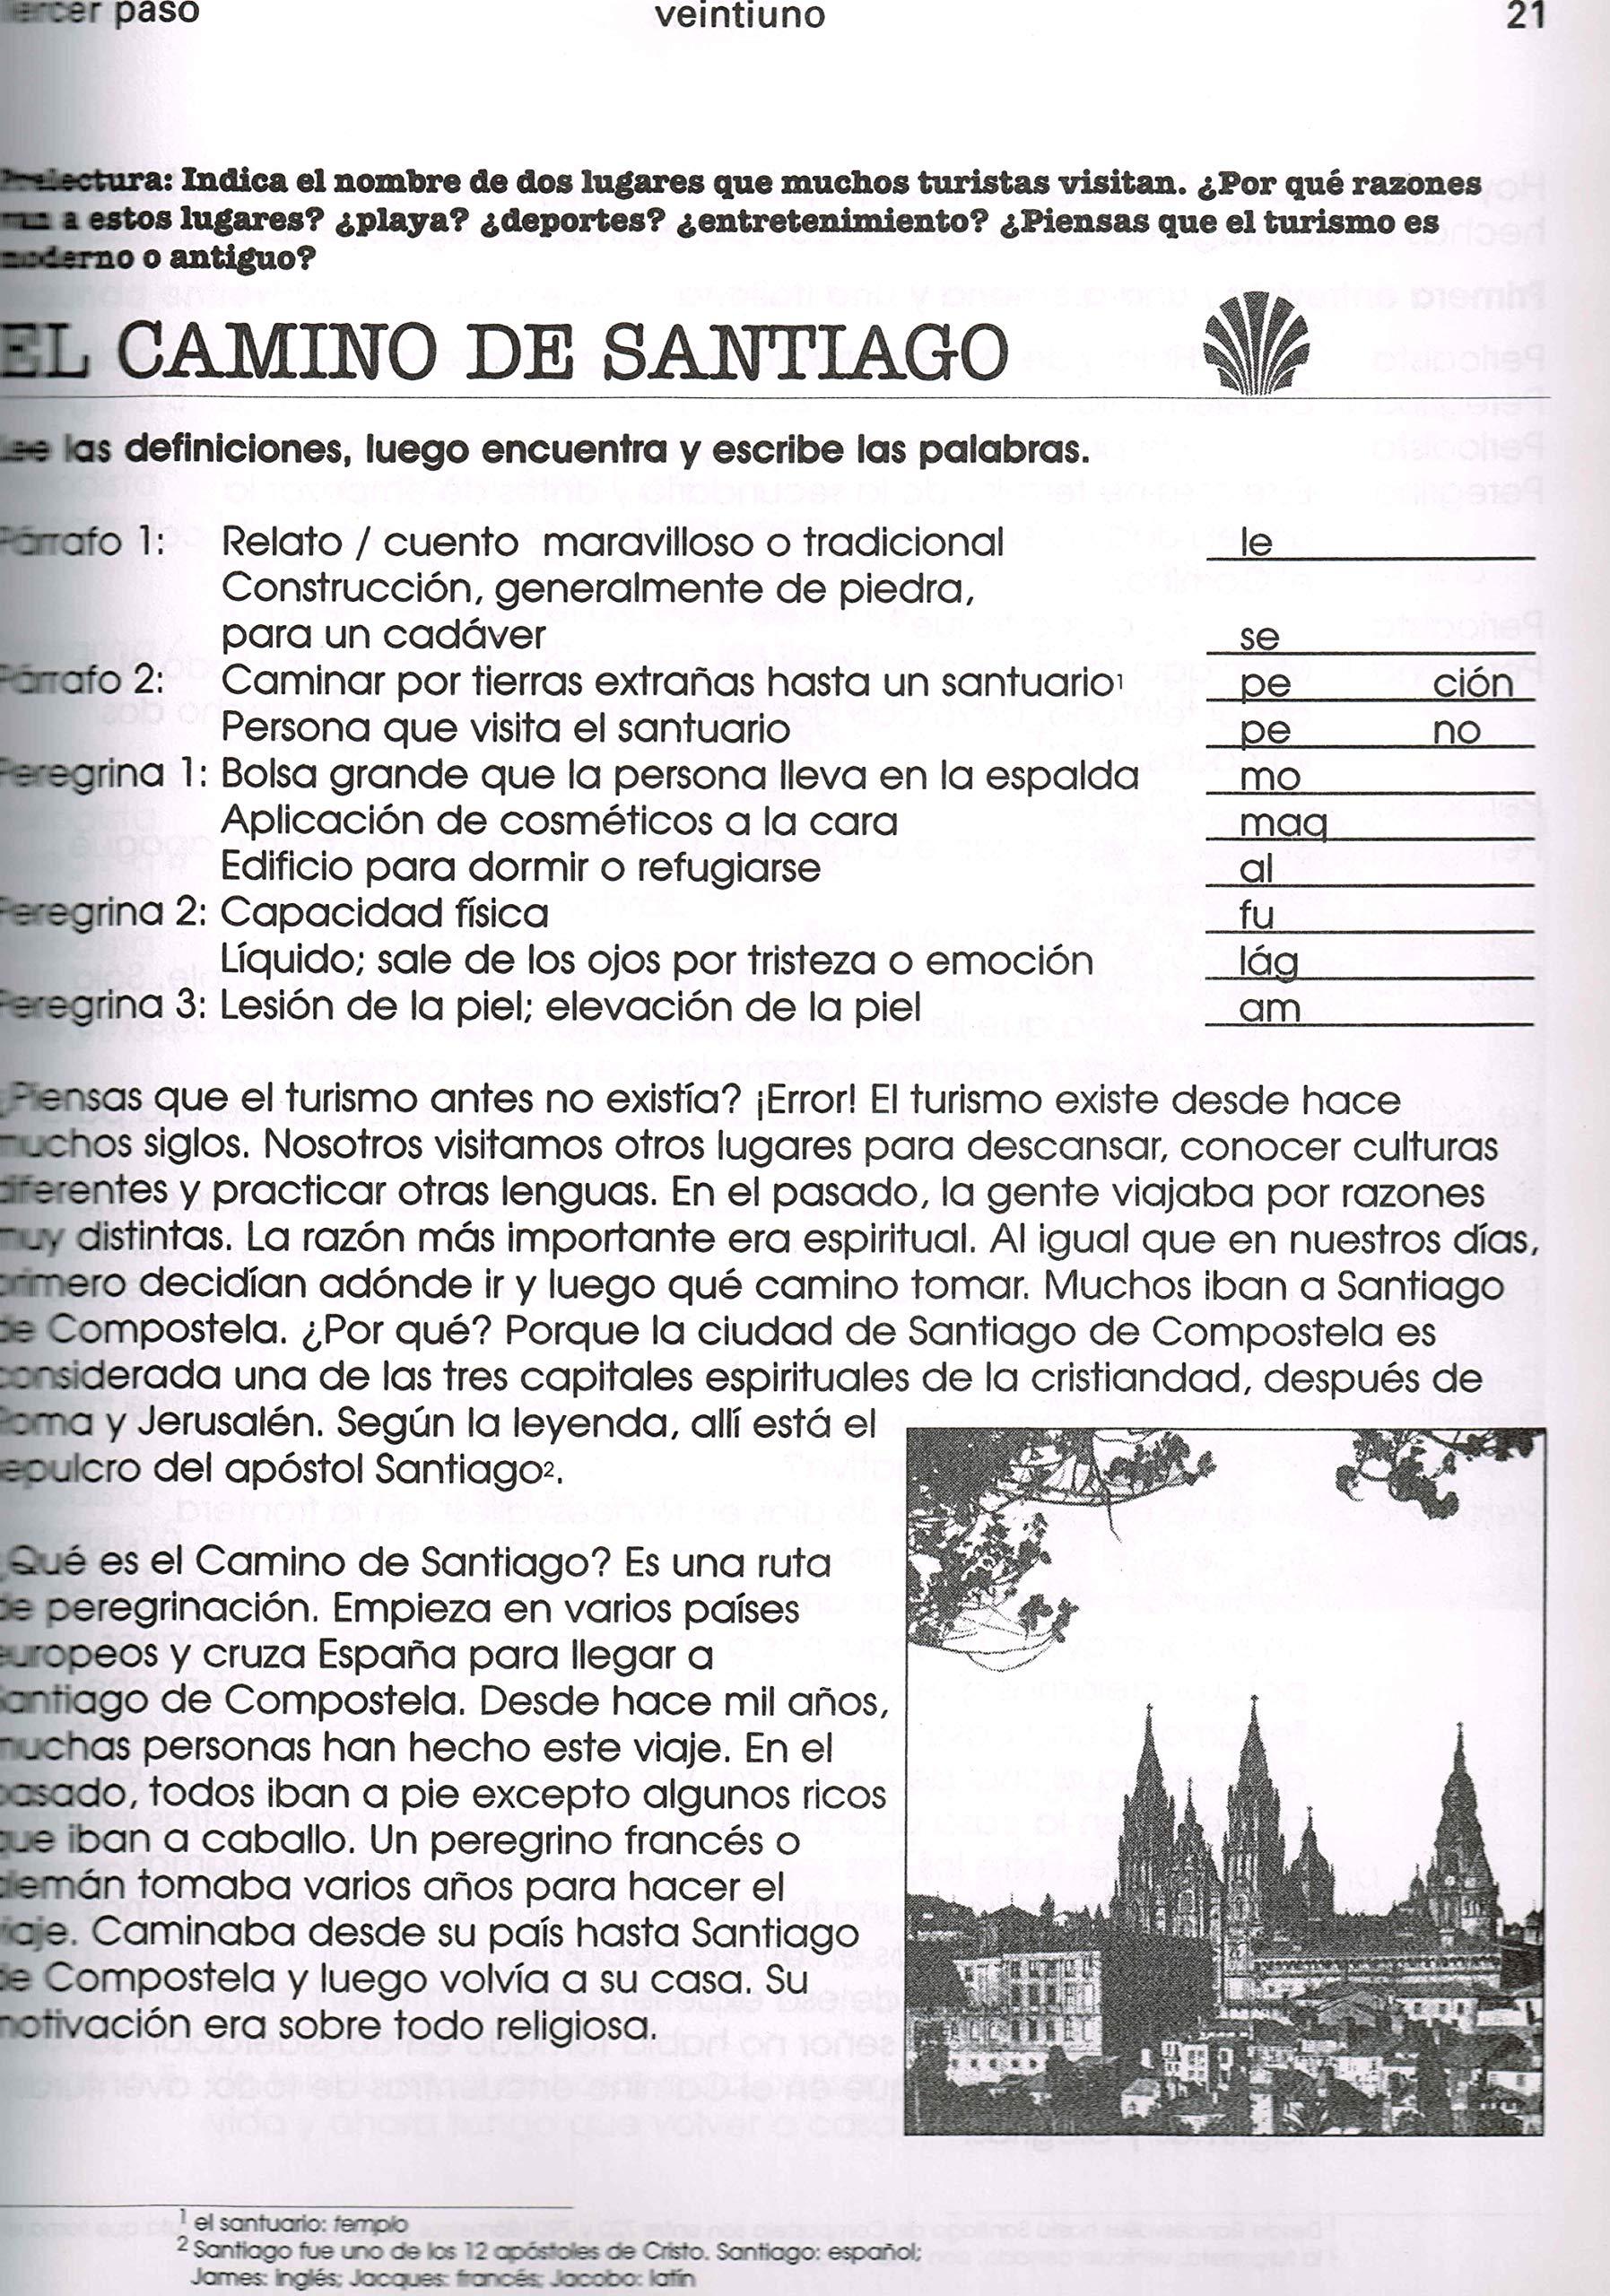 Amazon.com: Tercer Paso a La Cultura / Third Step into Spanish Culture (Spanish Edition) (9782921554954): Eva Neisser Echenberg, Emilia Deffis, ...